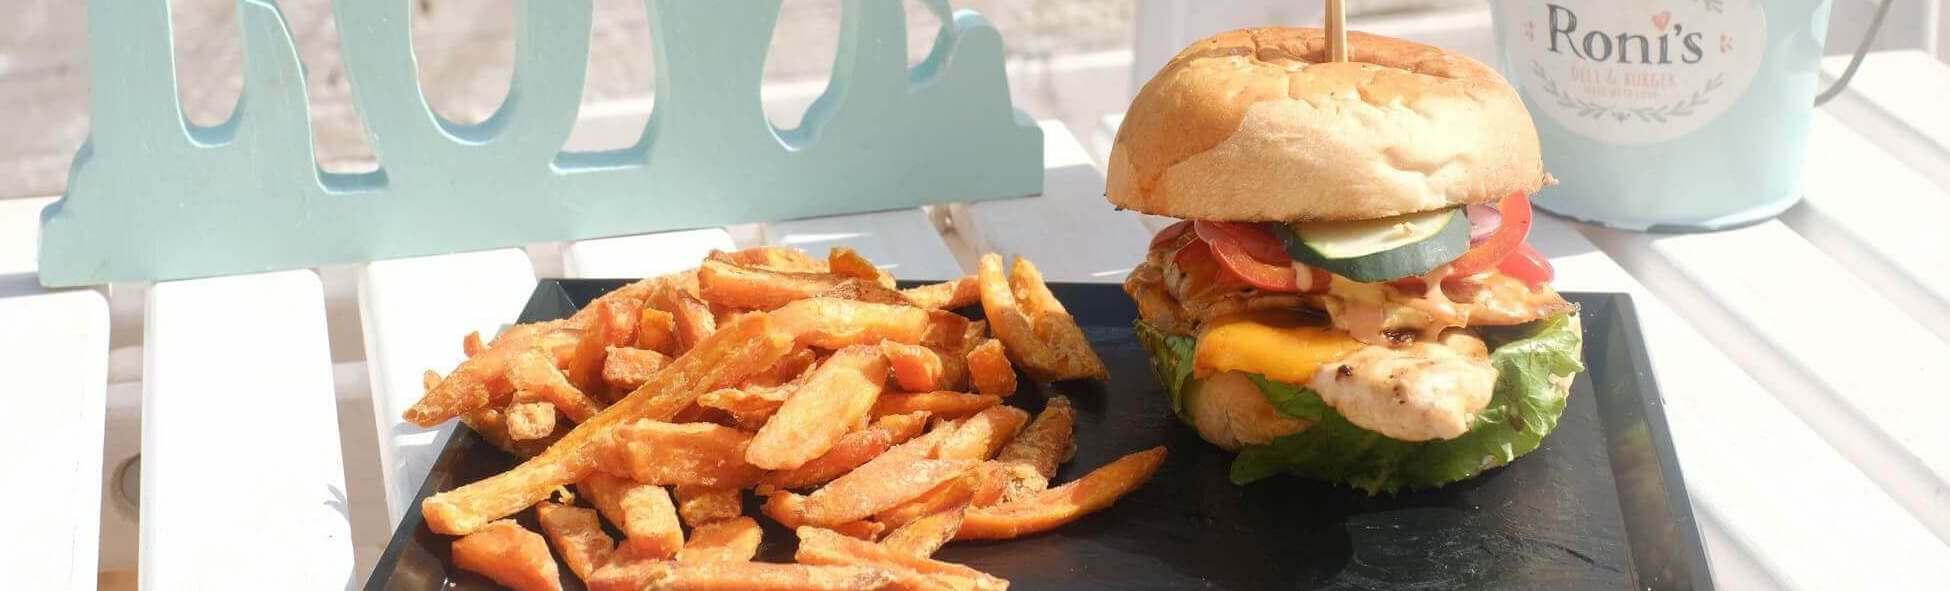 deli-ronis-burger-chicken-teriyaki-burgers